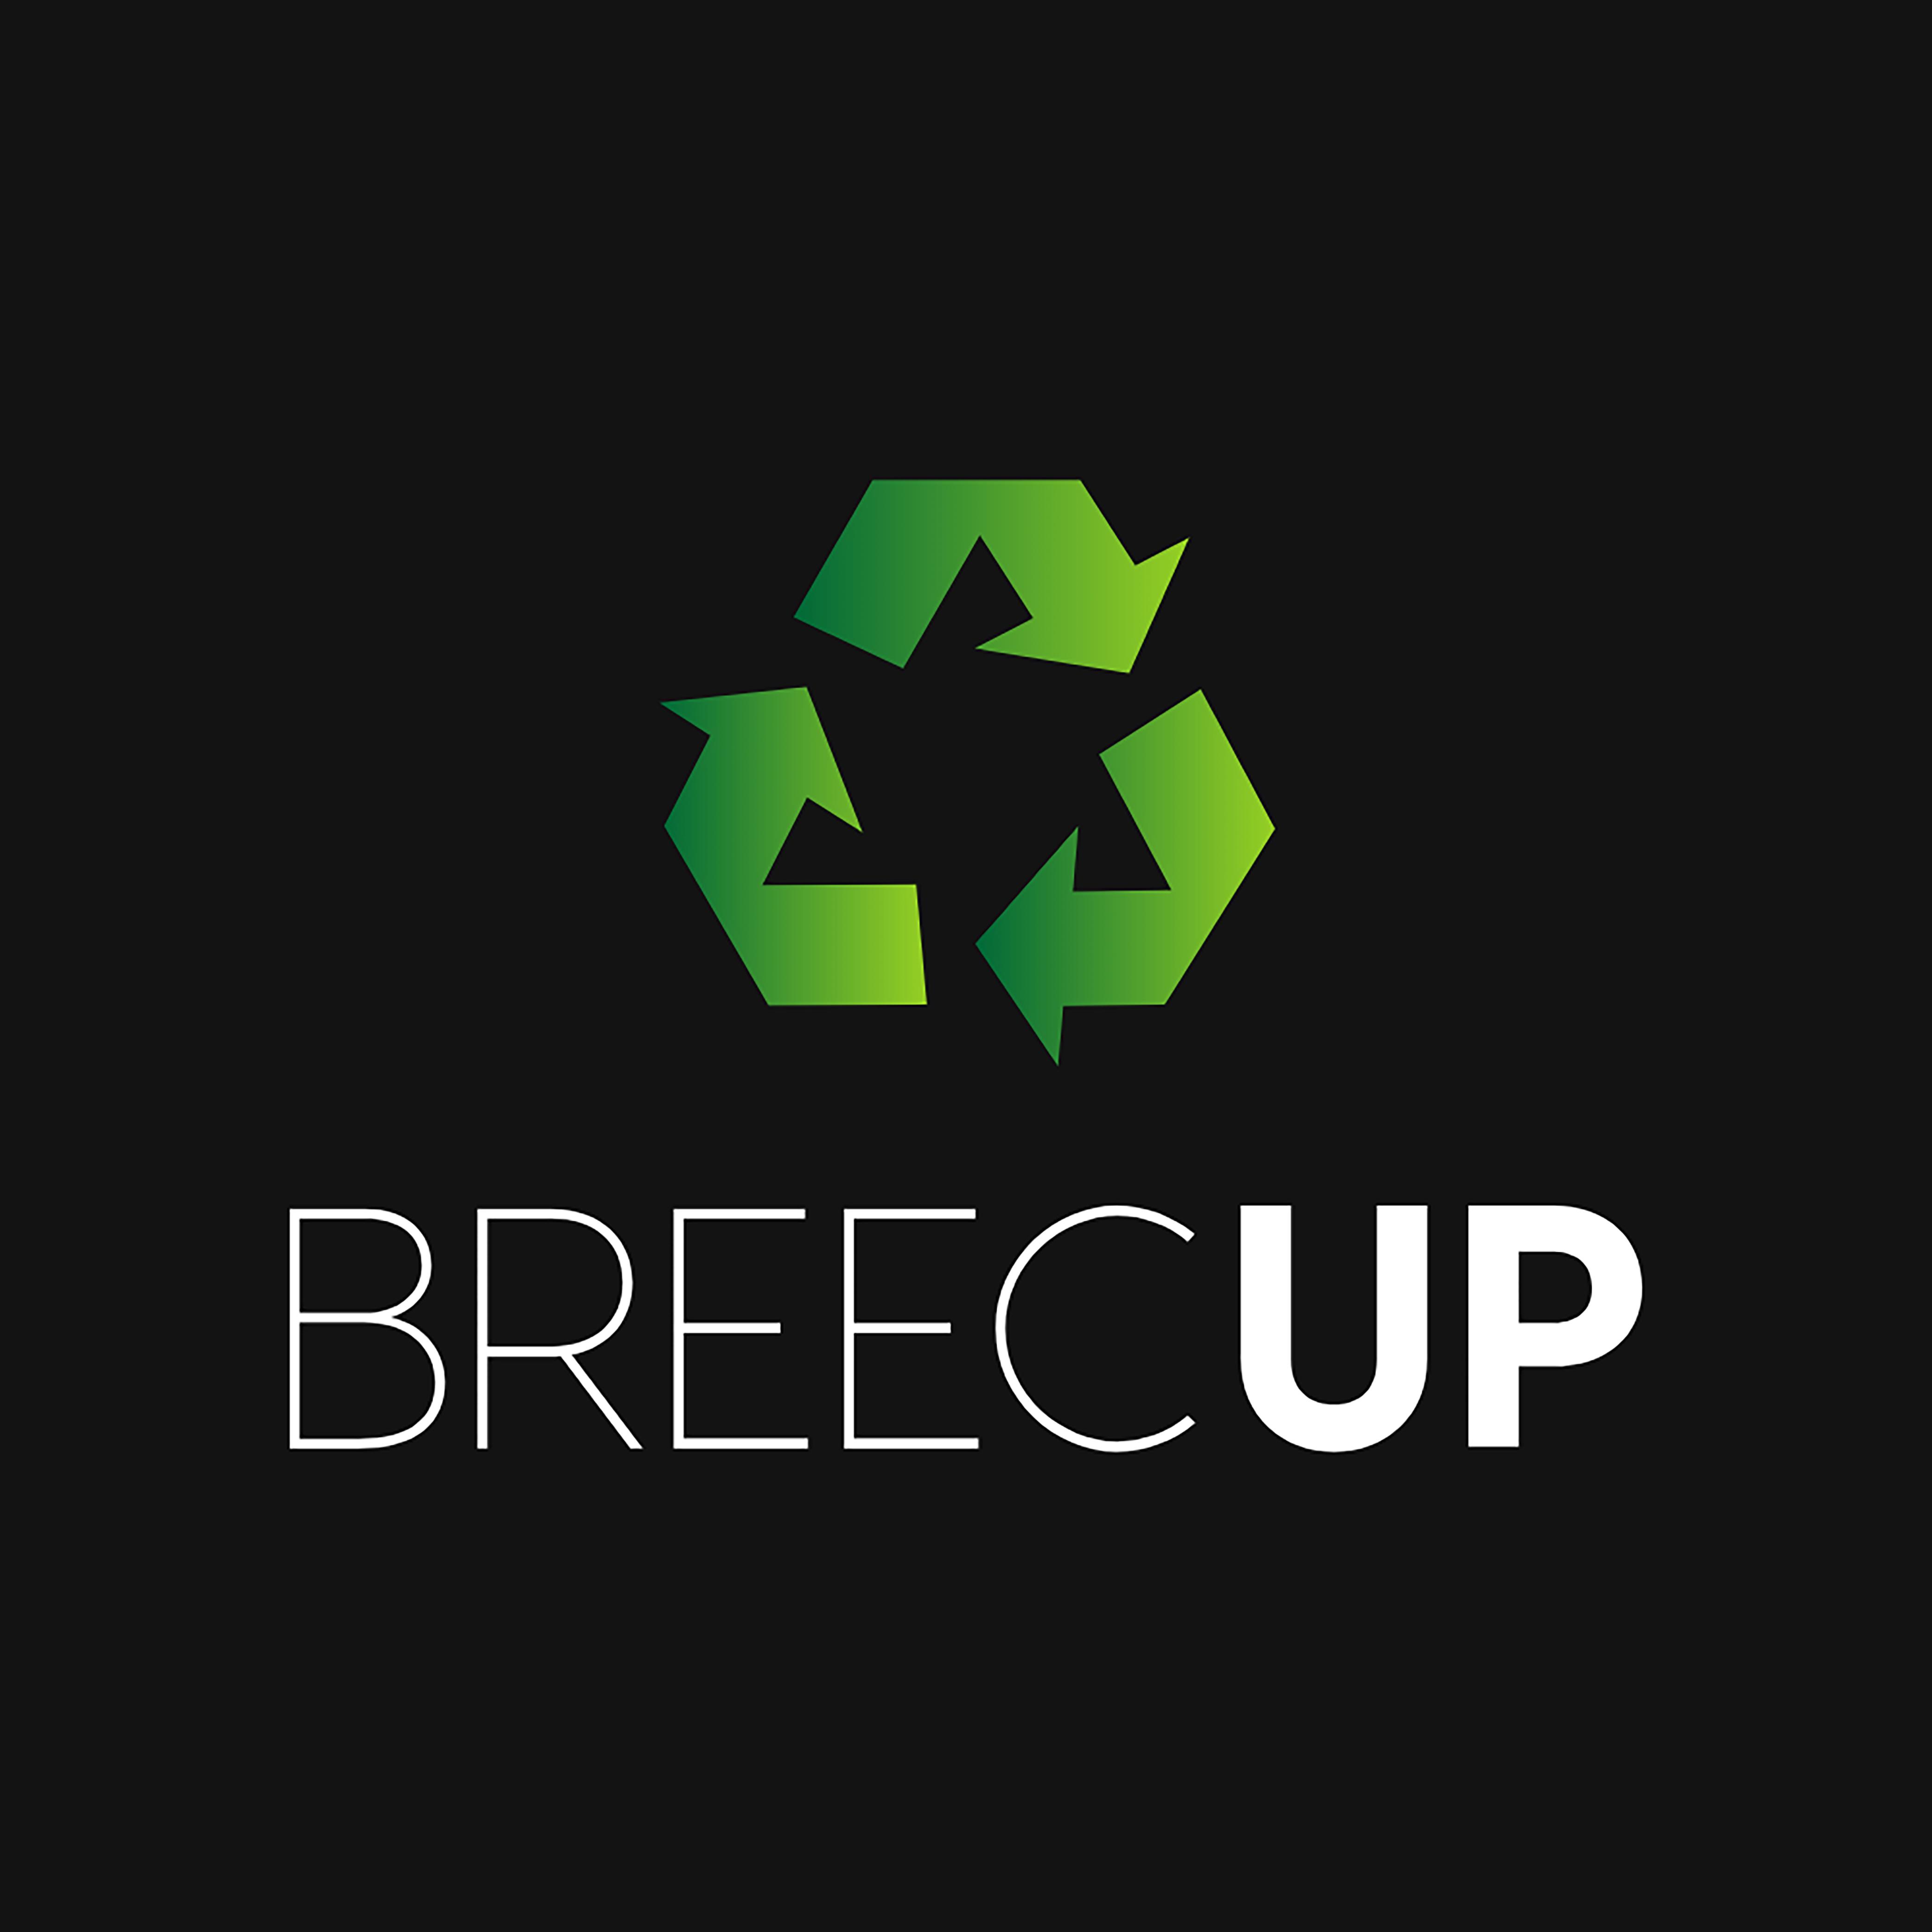 breecup